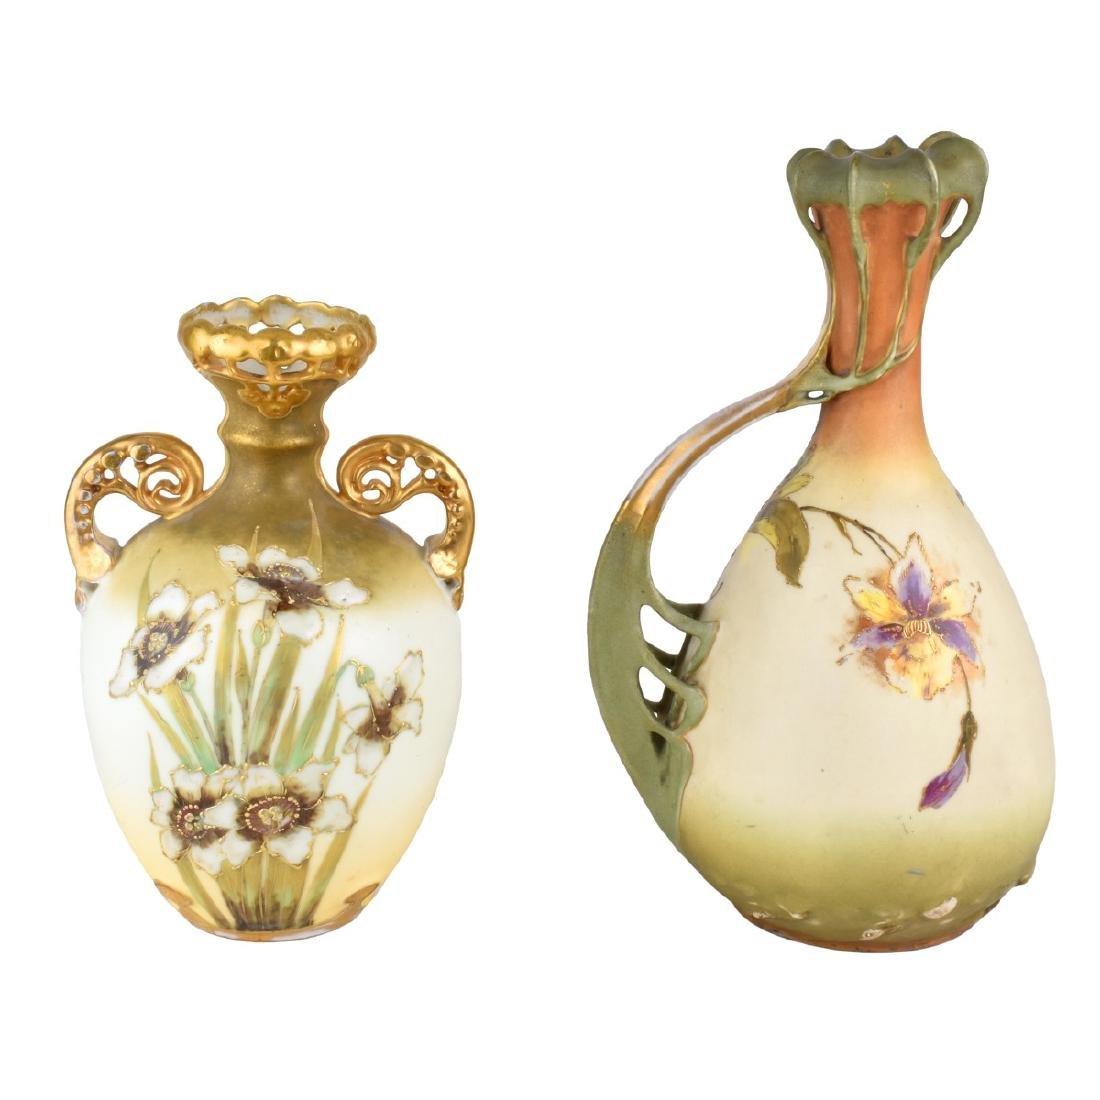 Turn Teplitz Pottery Ewer and Vase